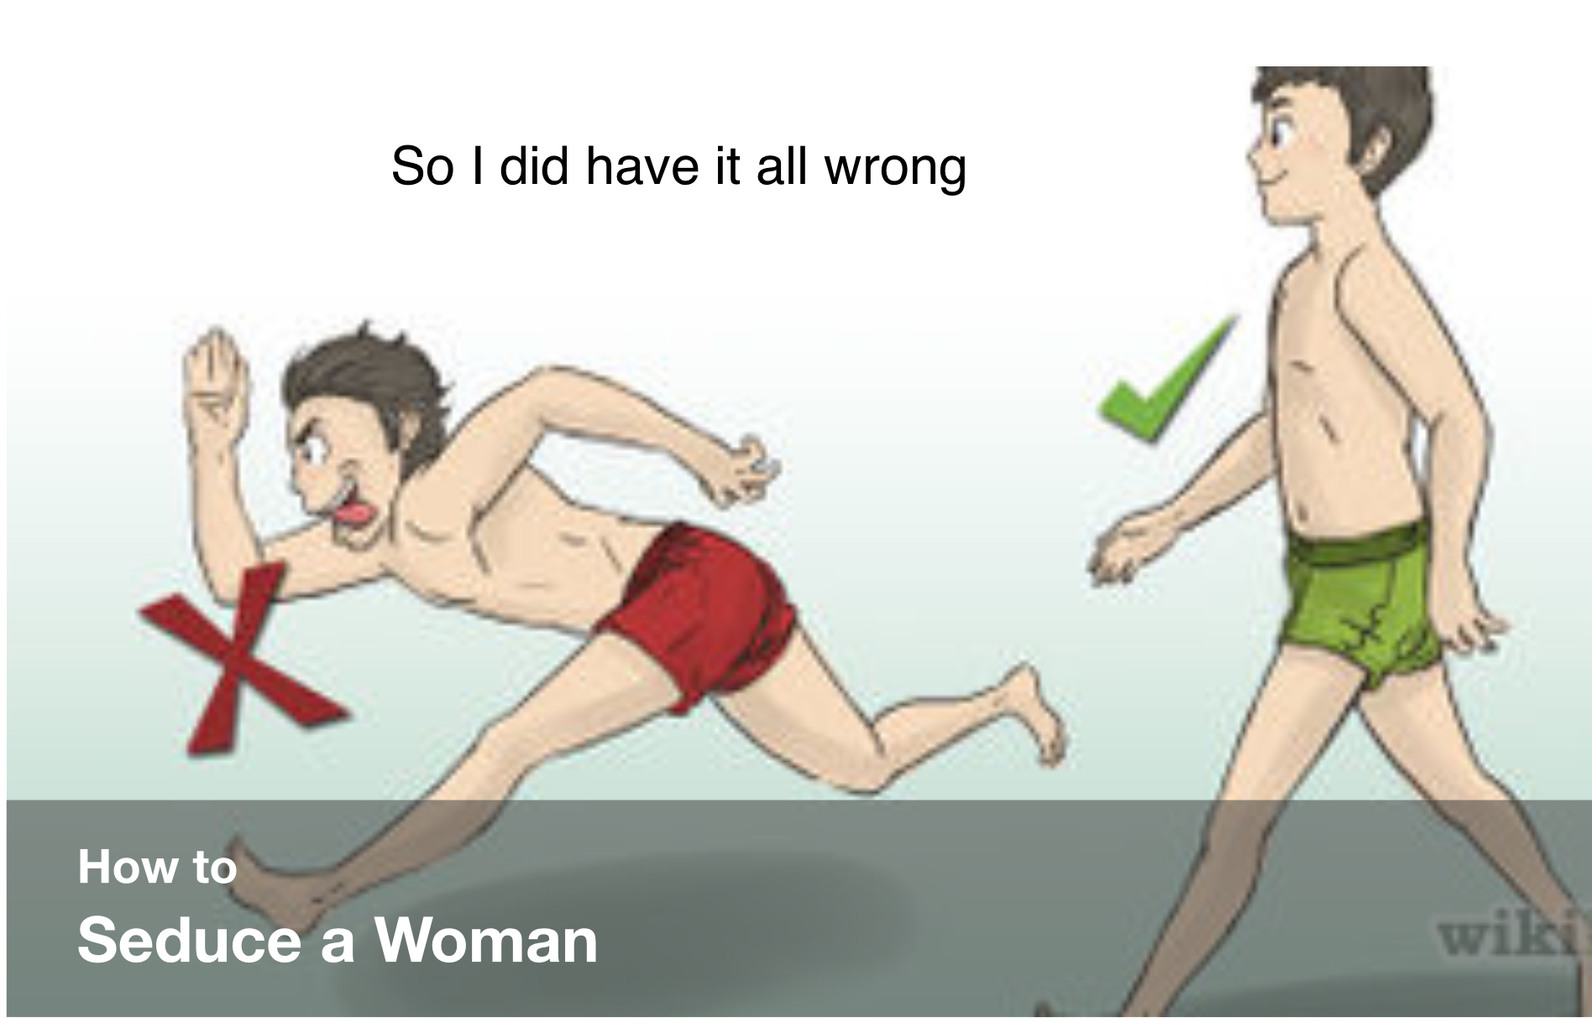 How to not seduce a woman - meme